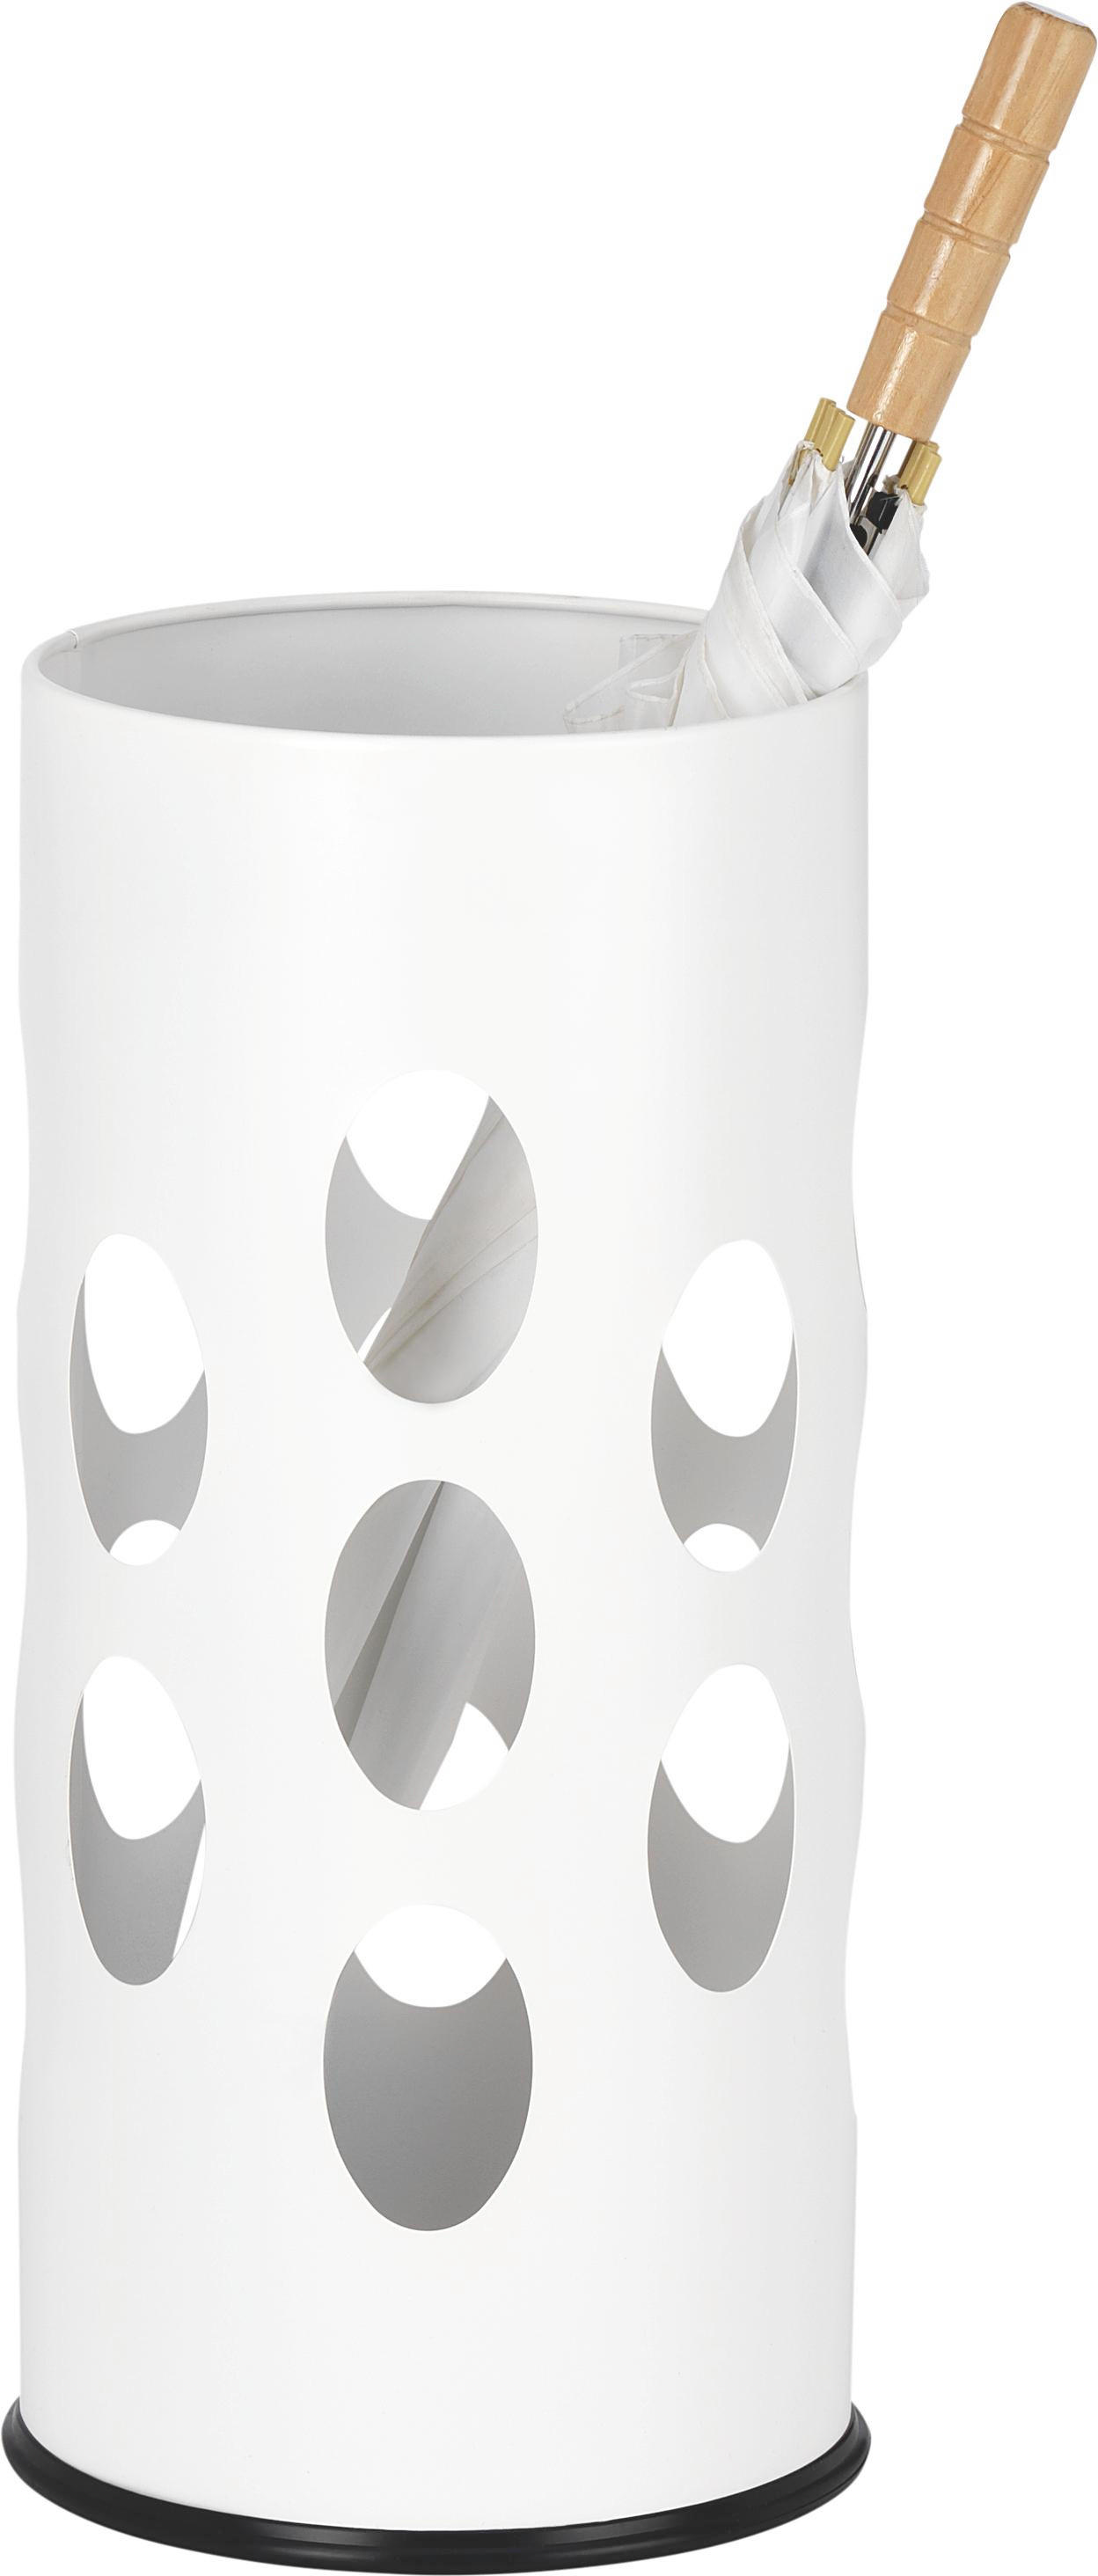 STALAK ZA KIŠOBRANE - bijela, Design, metal (23,50/50/23,50cm) - BOXXX